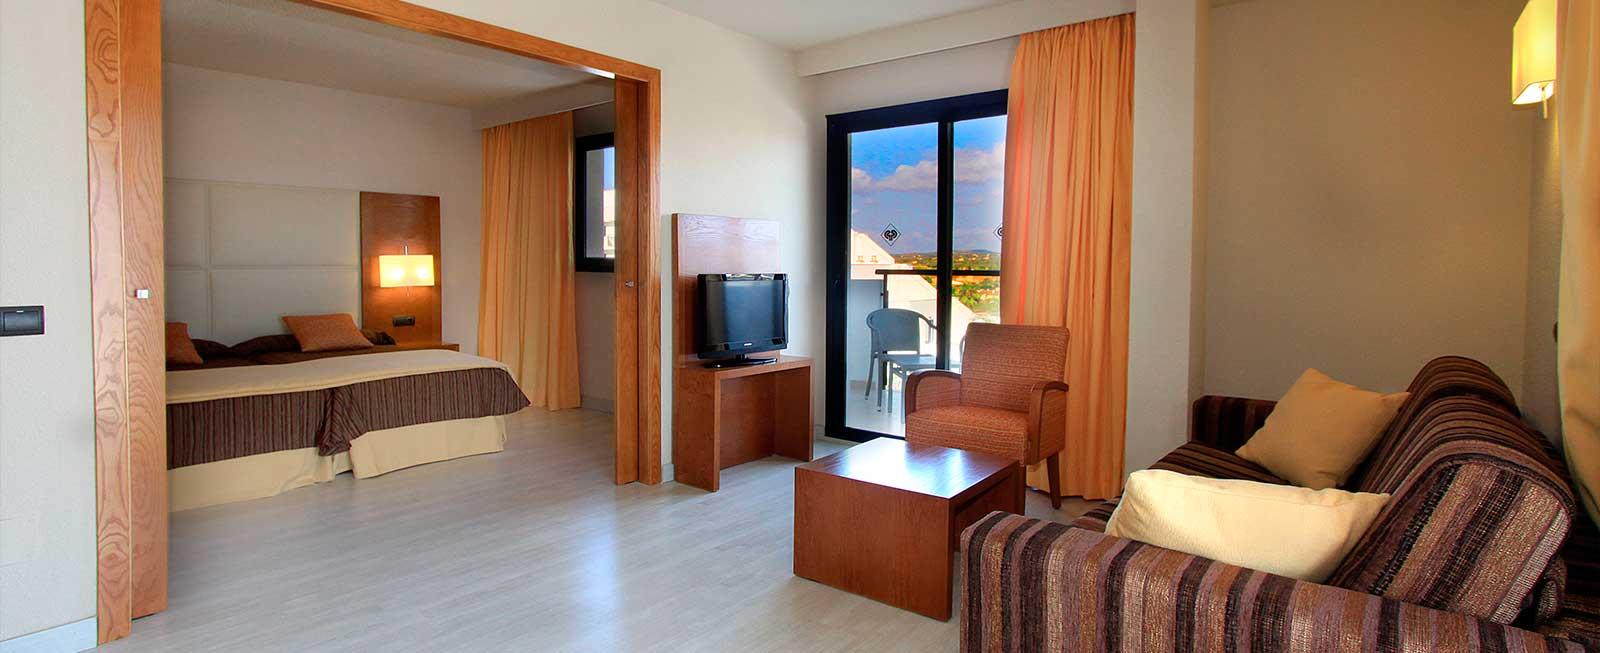 Doble Protur plameras Playa Aparthotel